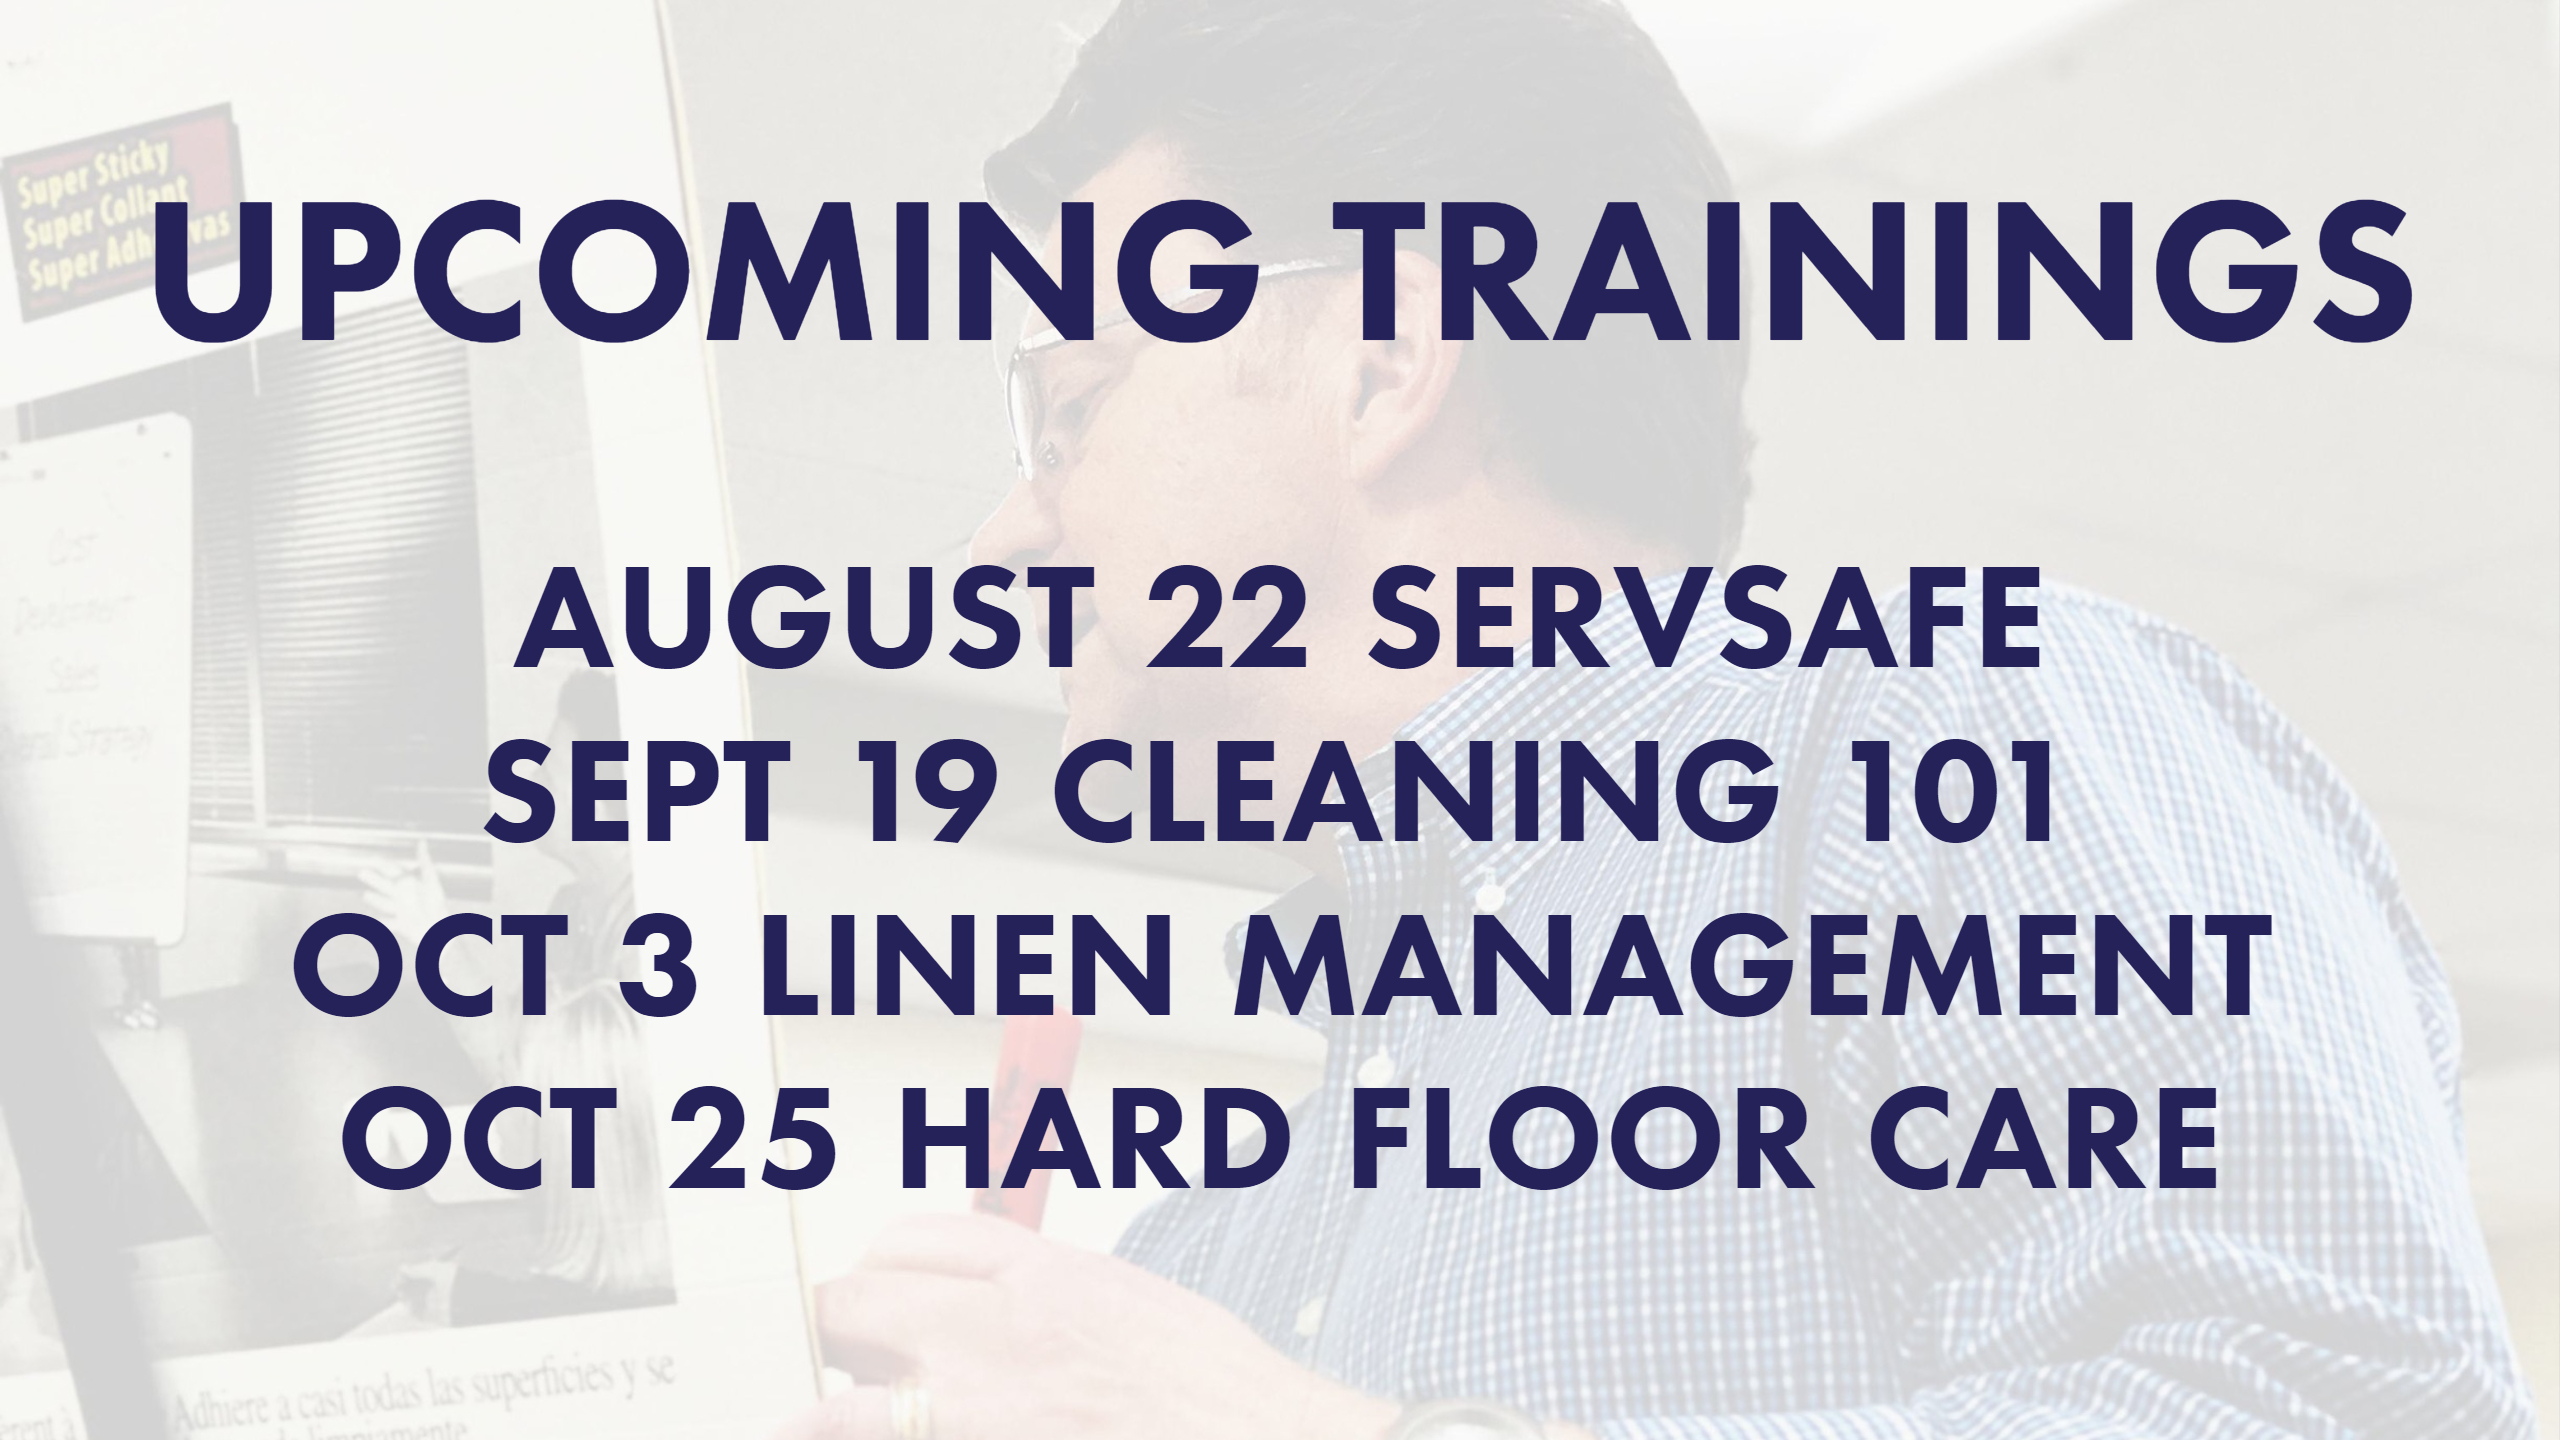 Upcoming Trainings